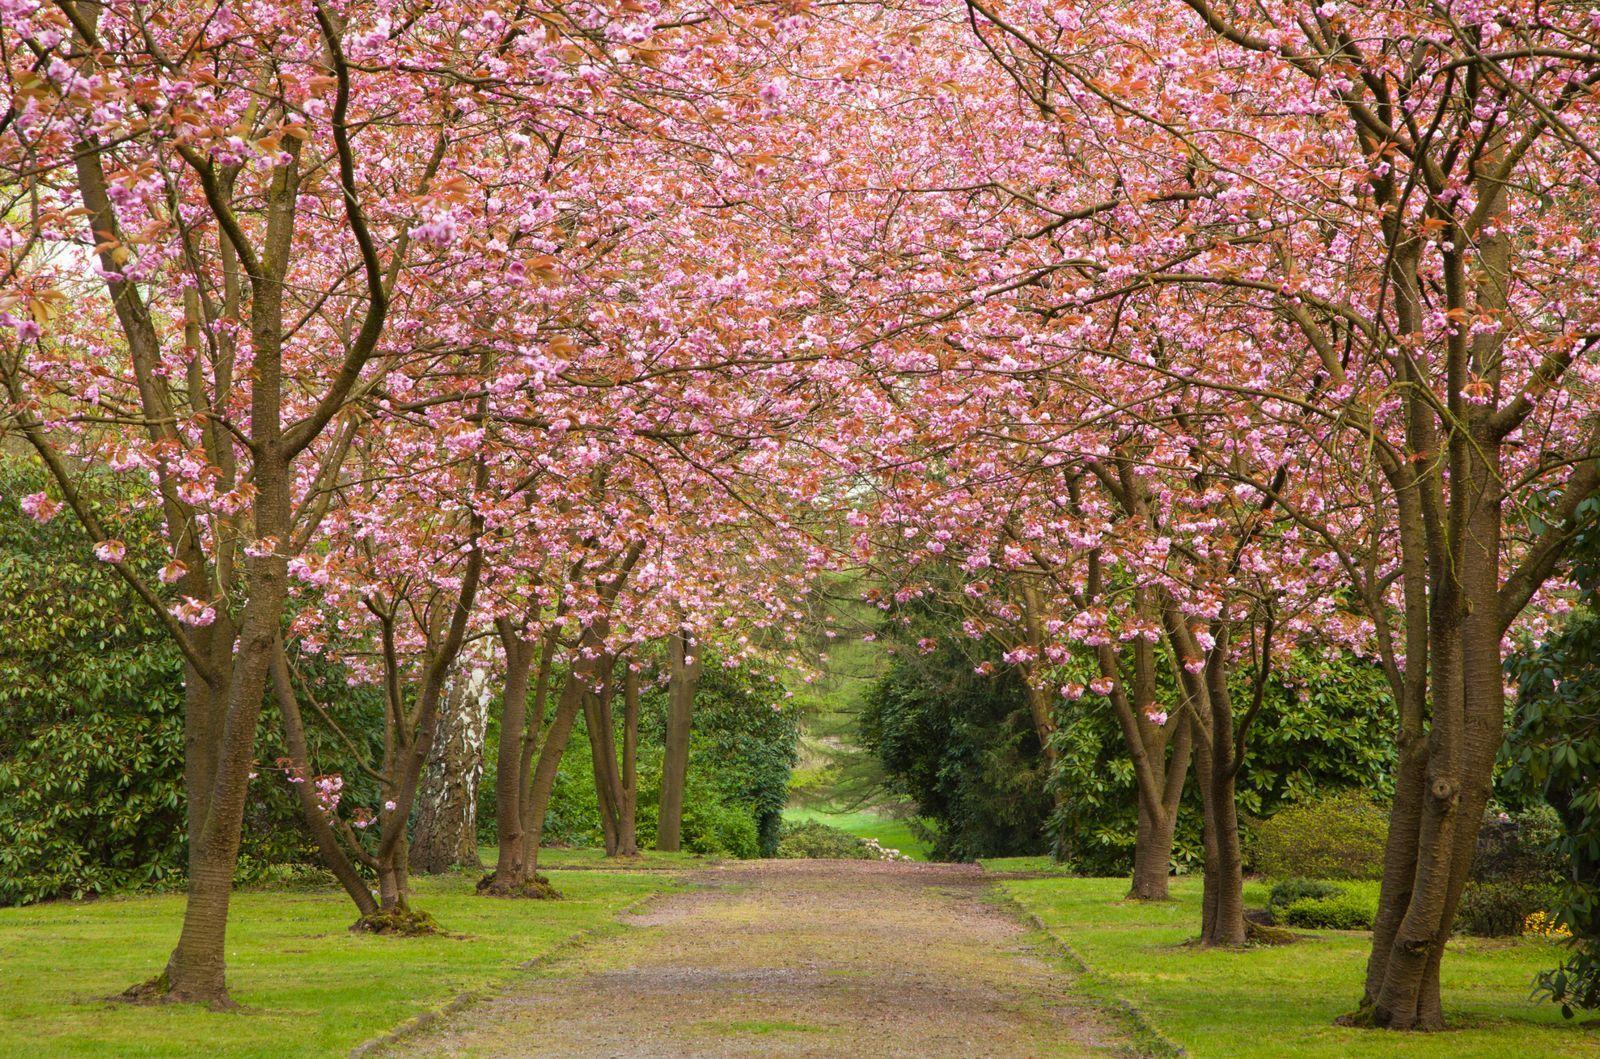 Cherry Blossom Tree Facts That You Definitely Never Knew Before Cherry Blossom Tree Cherry Blossom Cherry Tree